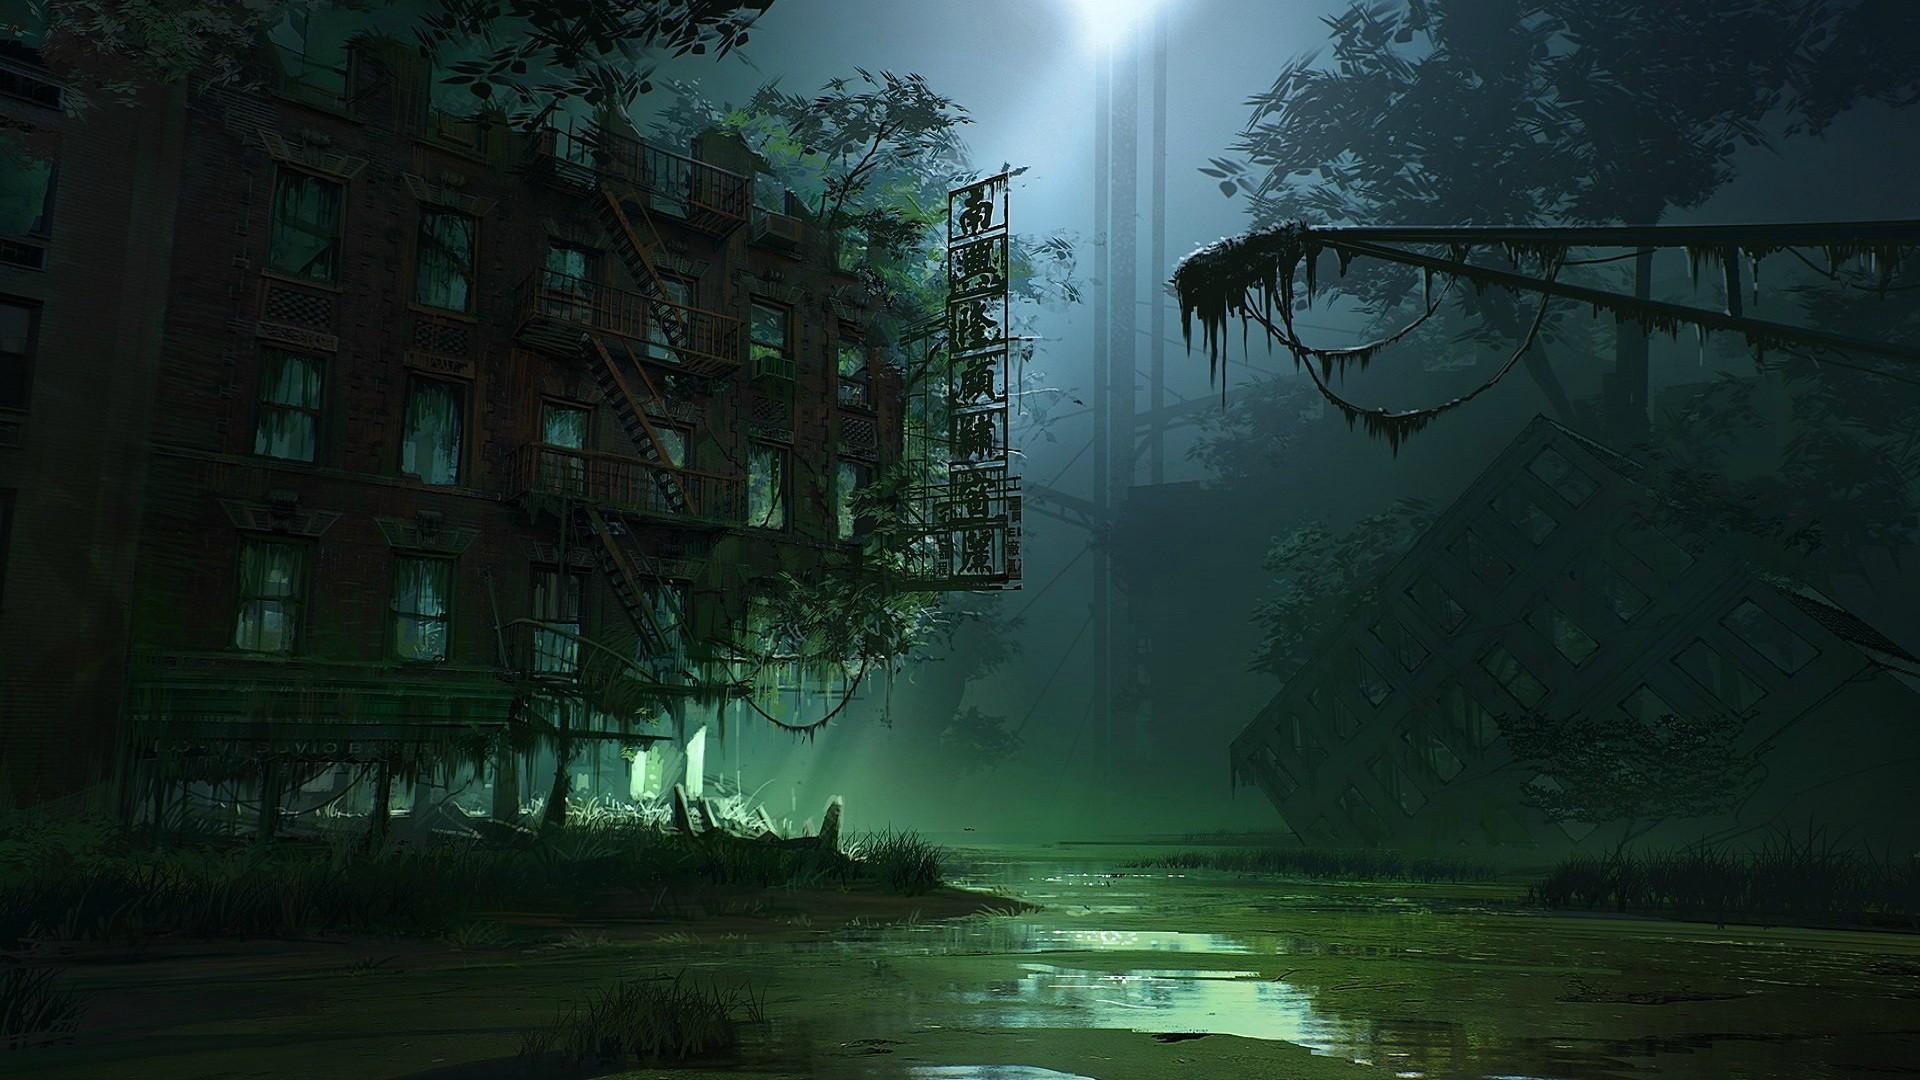 Sci Fi Post Apocalyptic 1920x1080